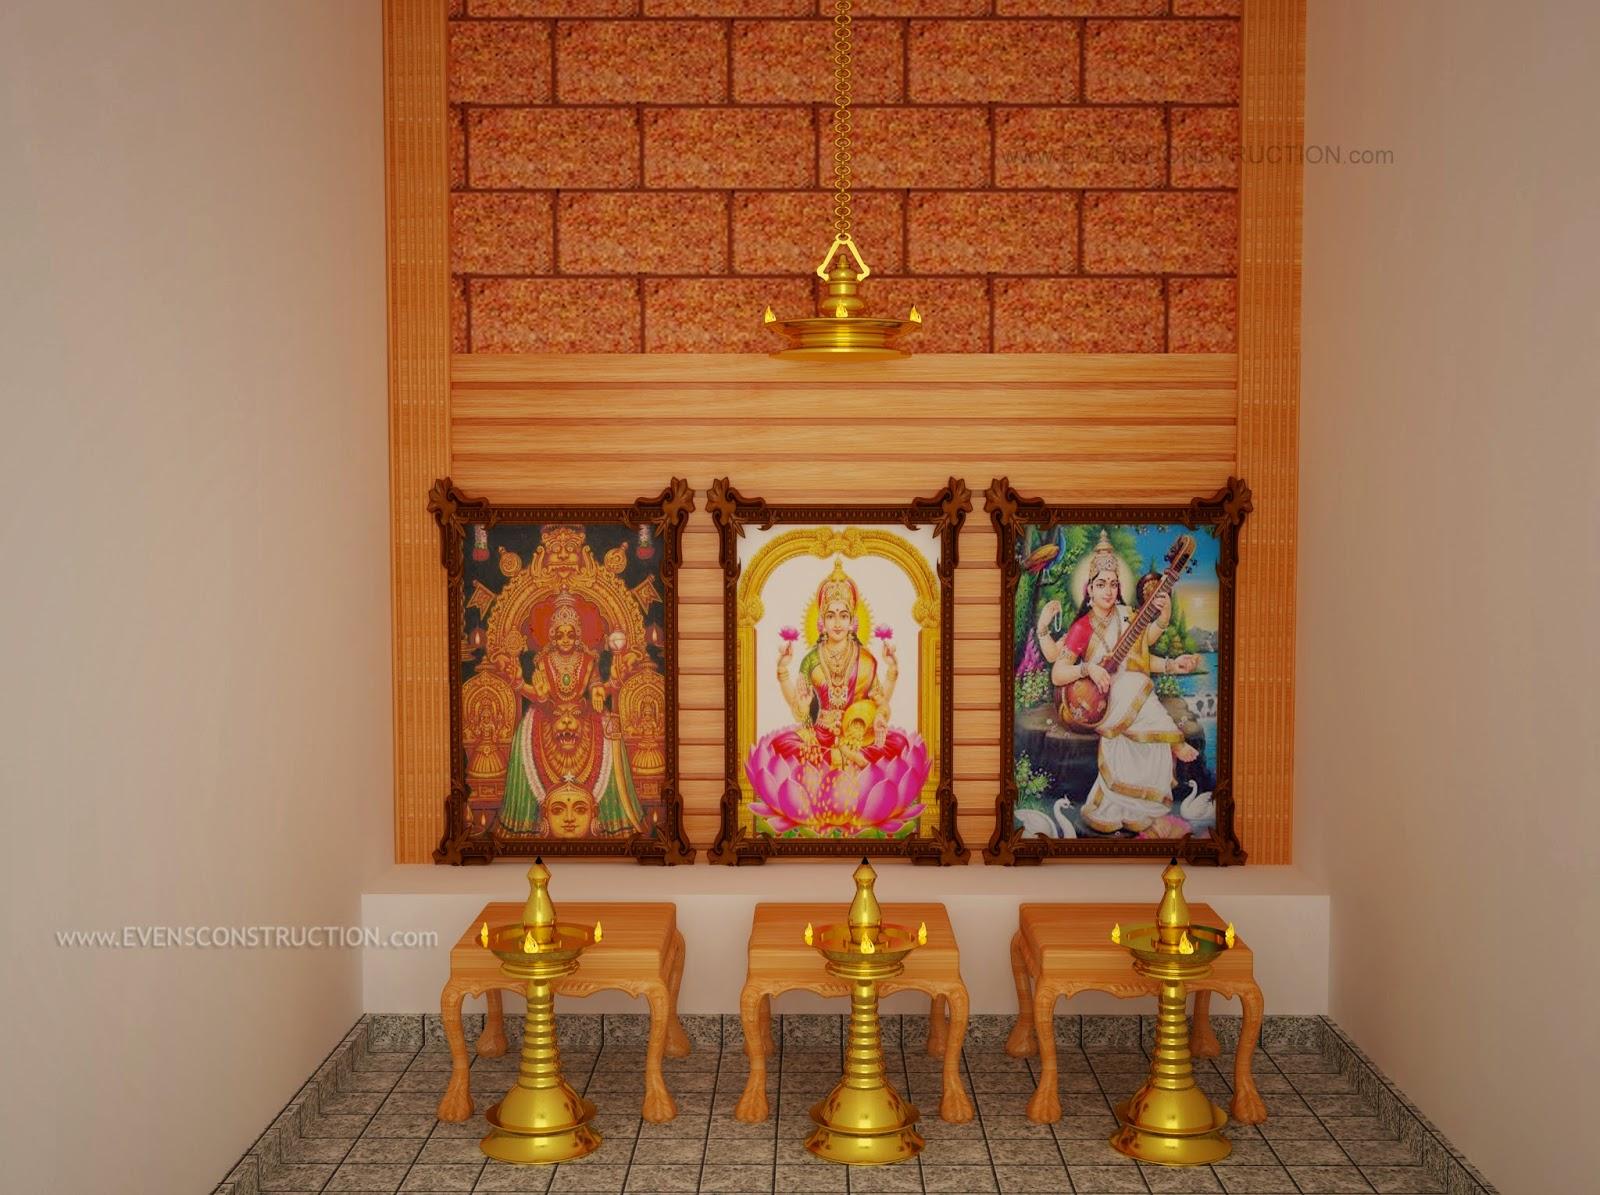 Evens construction pvt ltd pooja room interior for Pooja room interior designs